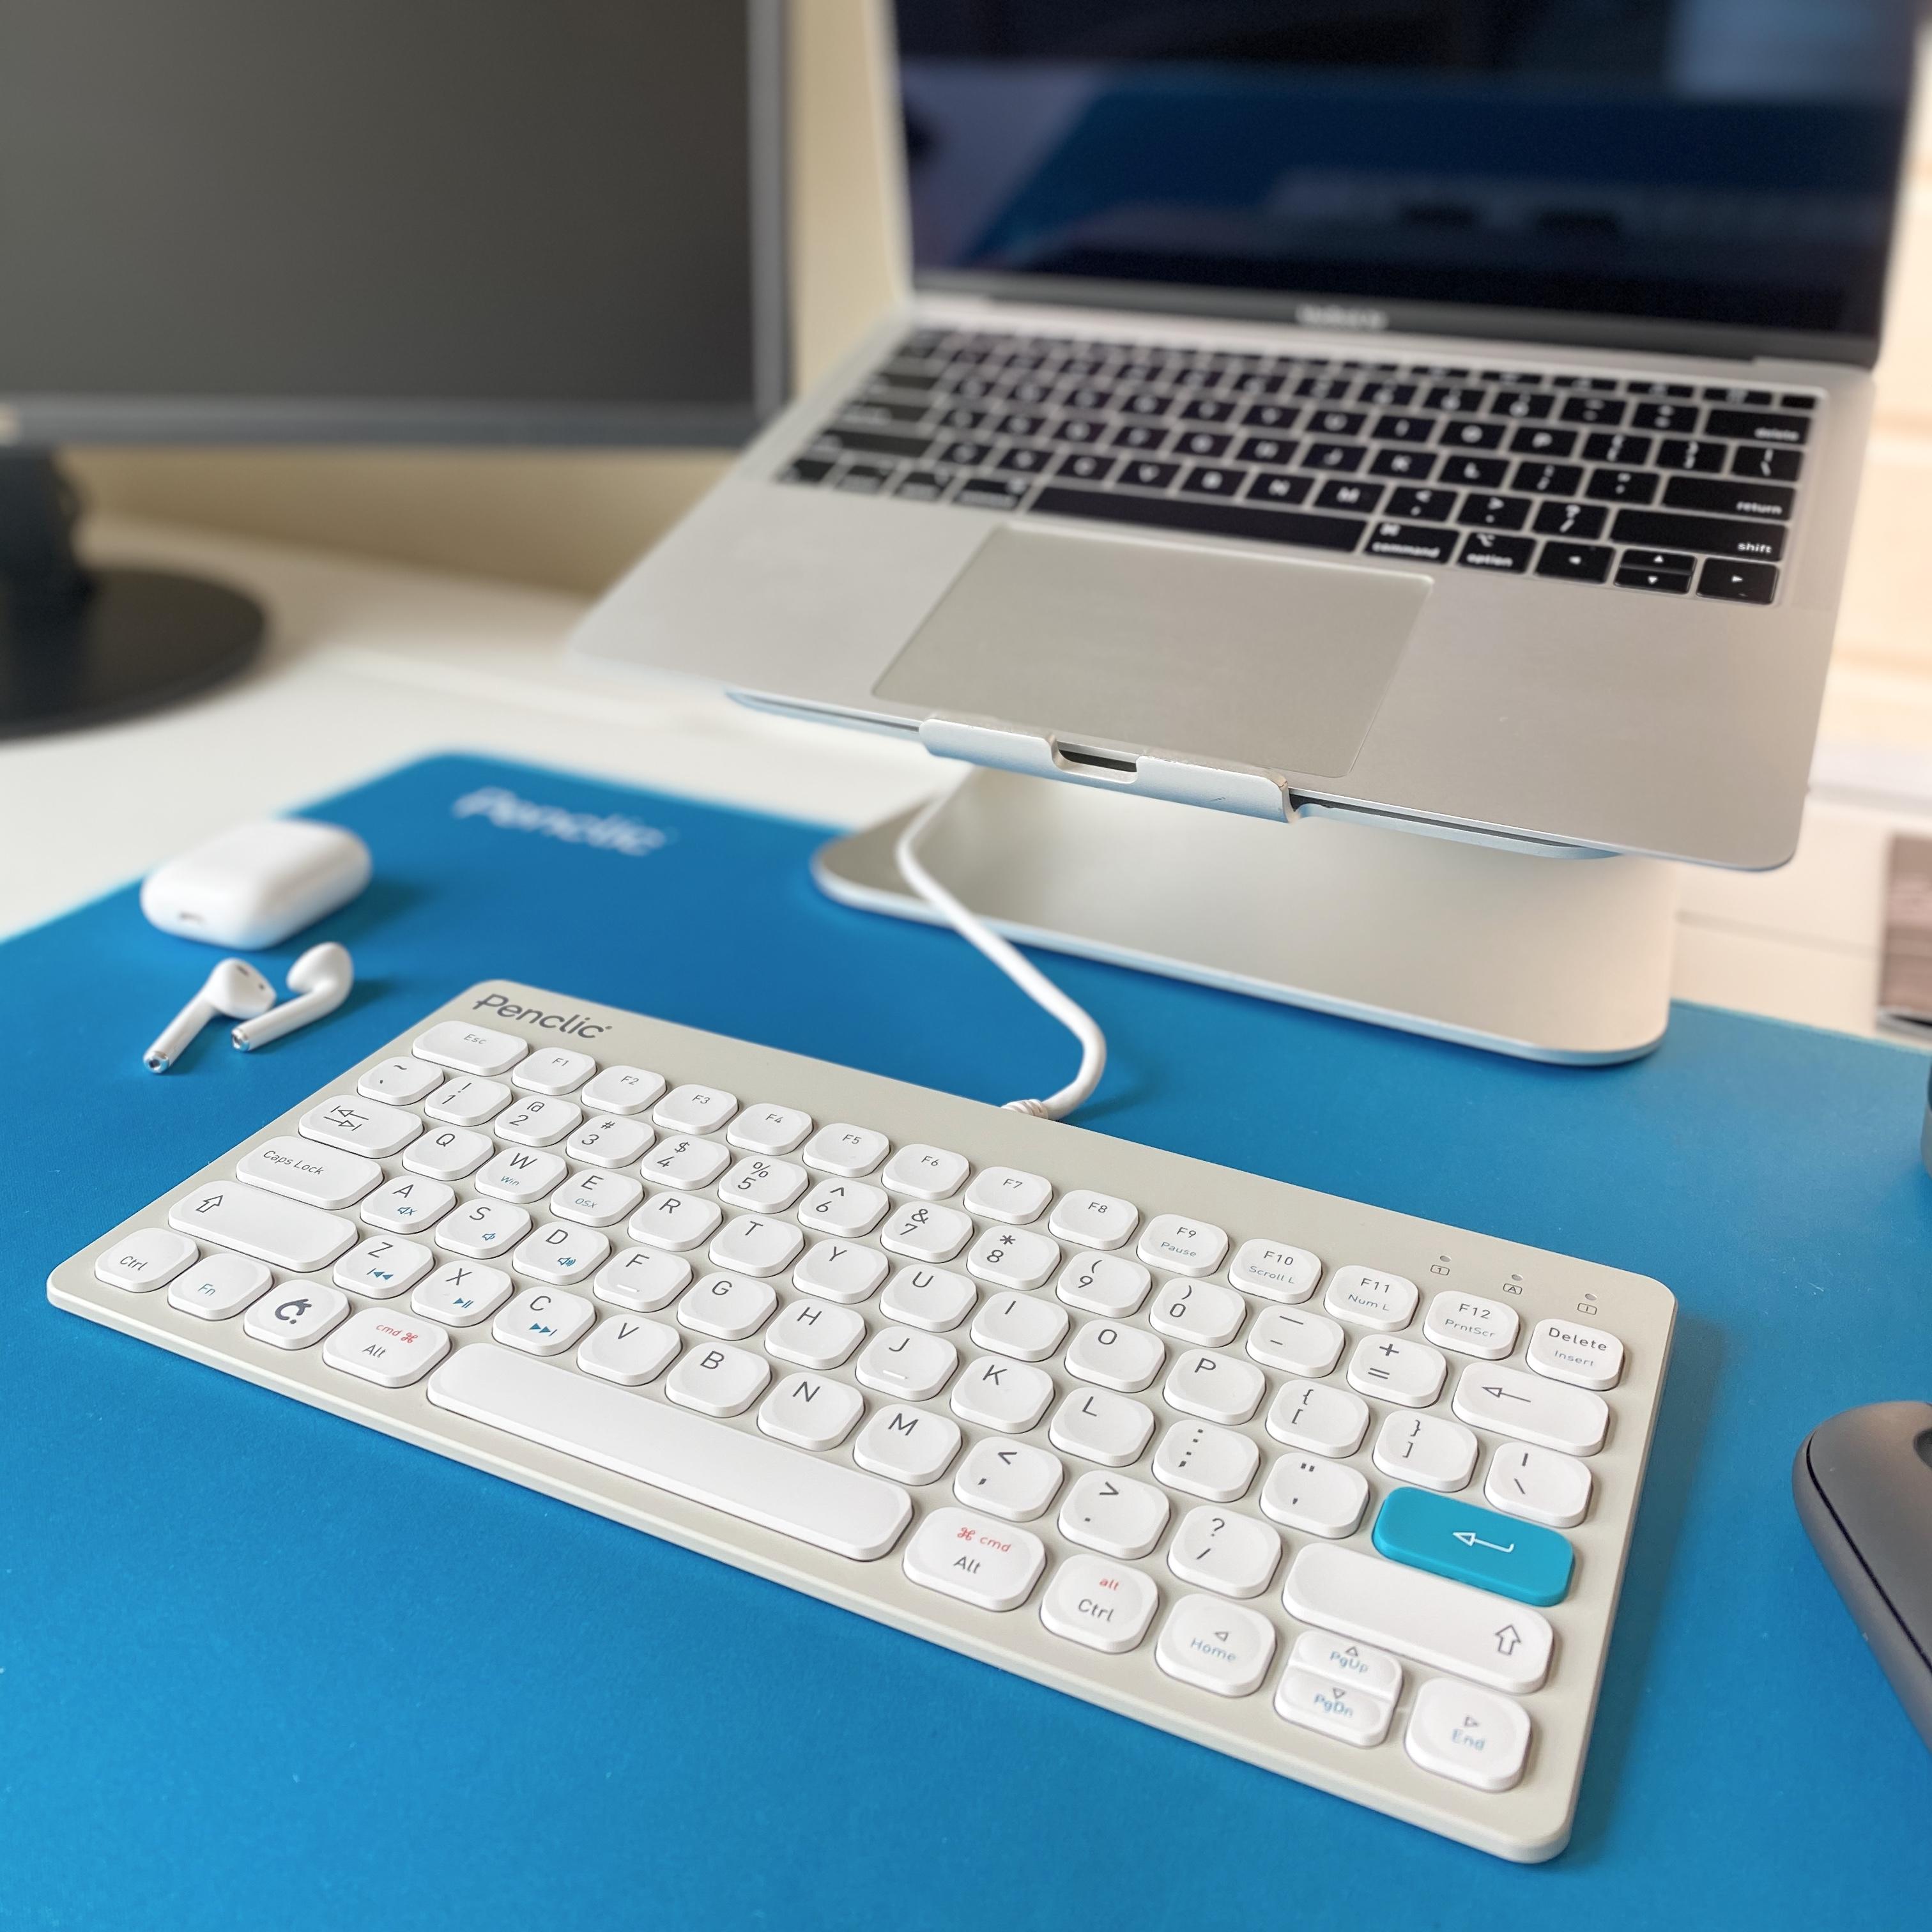 ergonomic desks set up